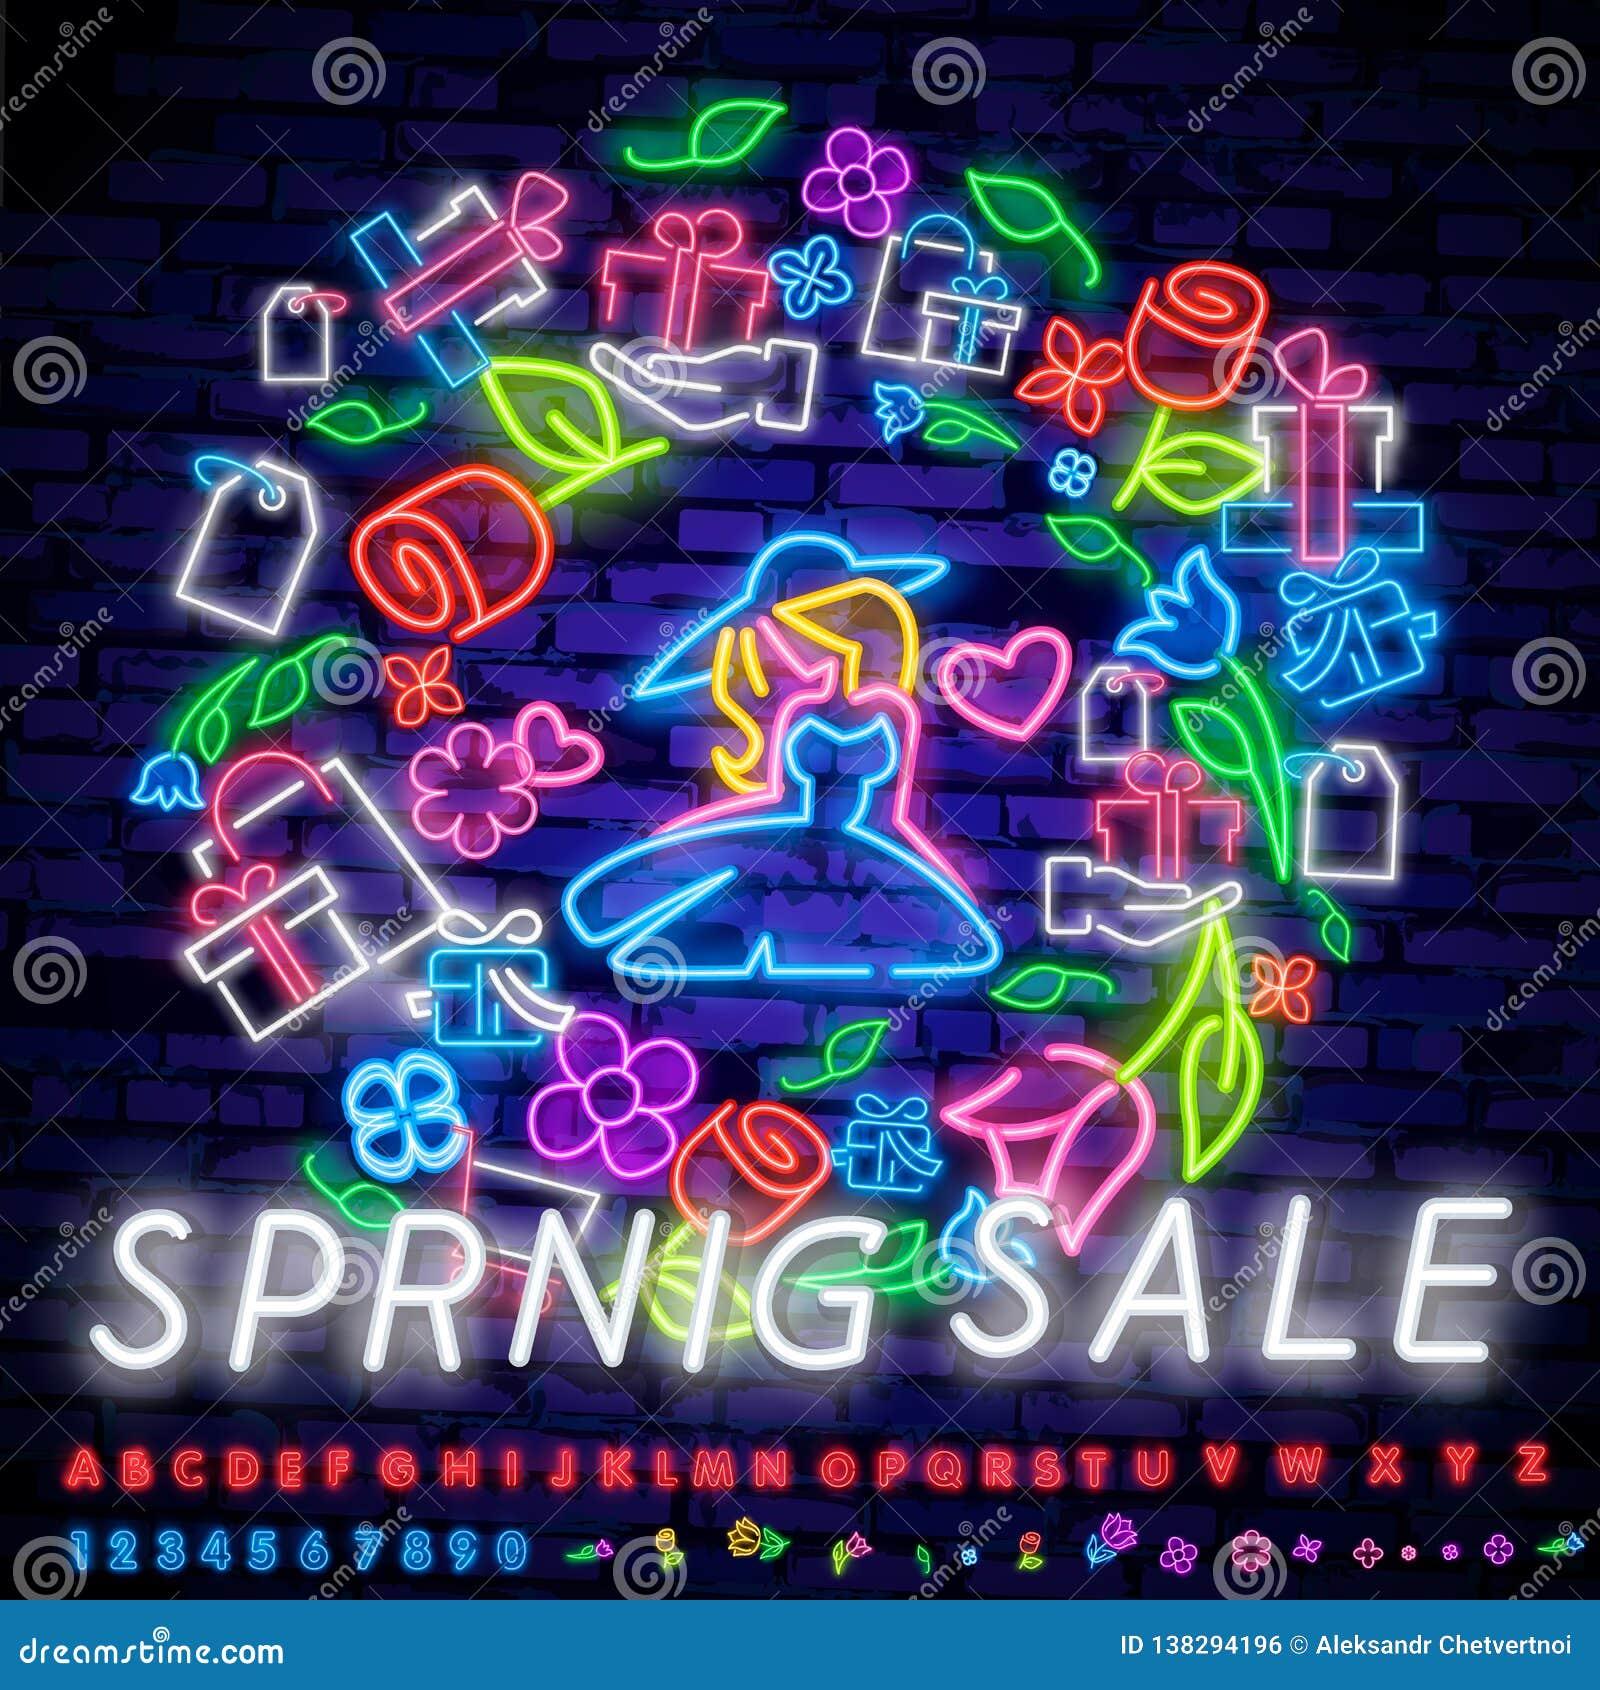 Neon alphabet and Spring Sale in flower frame over brick background. Spring sale, seasonal goods, store emblem. Spring concept.